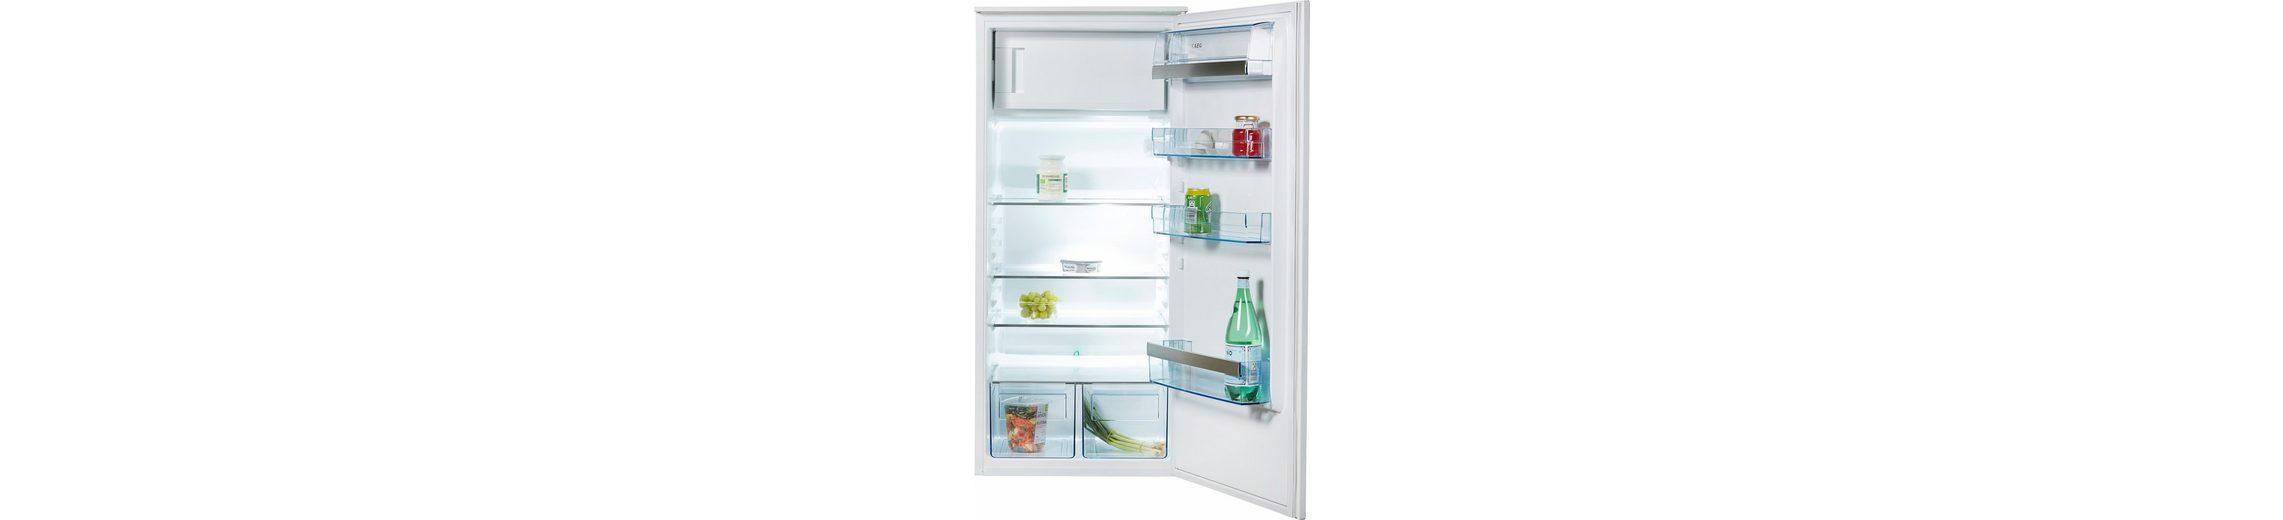 AEG integrierbarer Einbaukühlschrank SKA61240S3, A++, 121,8 cm